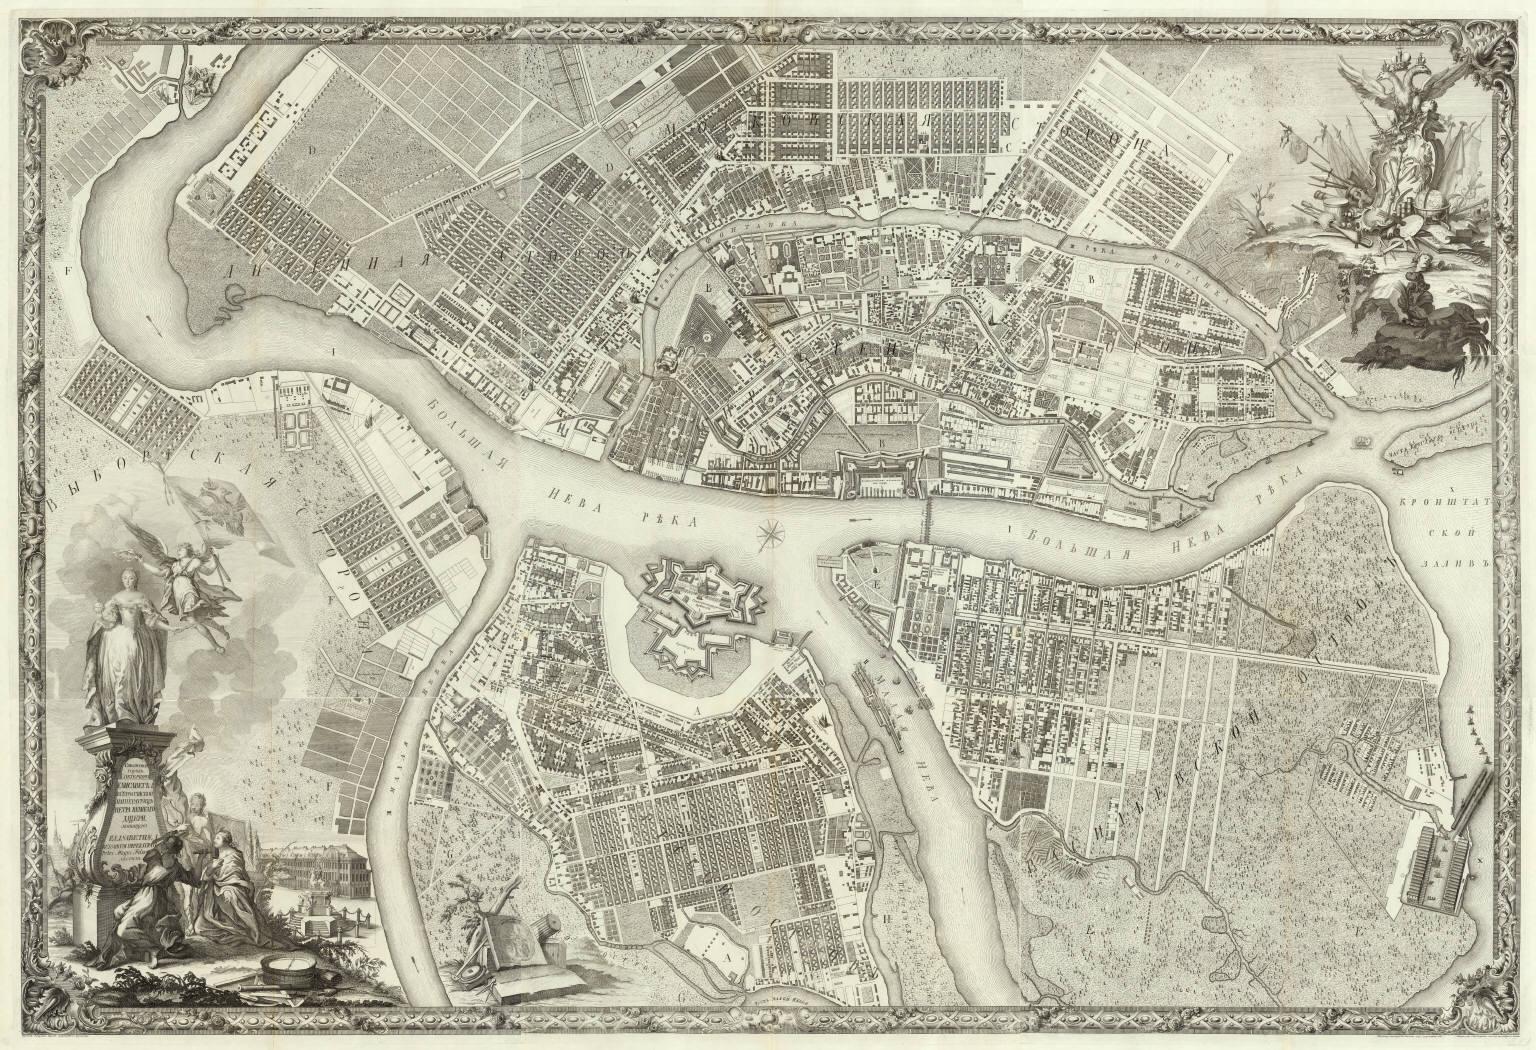 Composite: Plan Sanktpeterburga